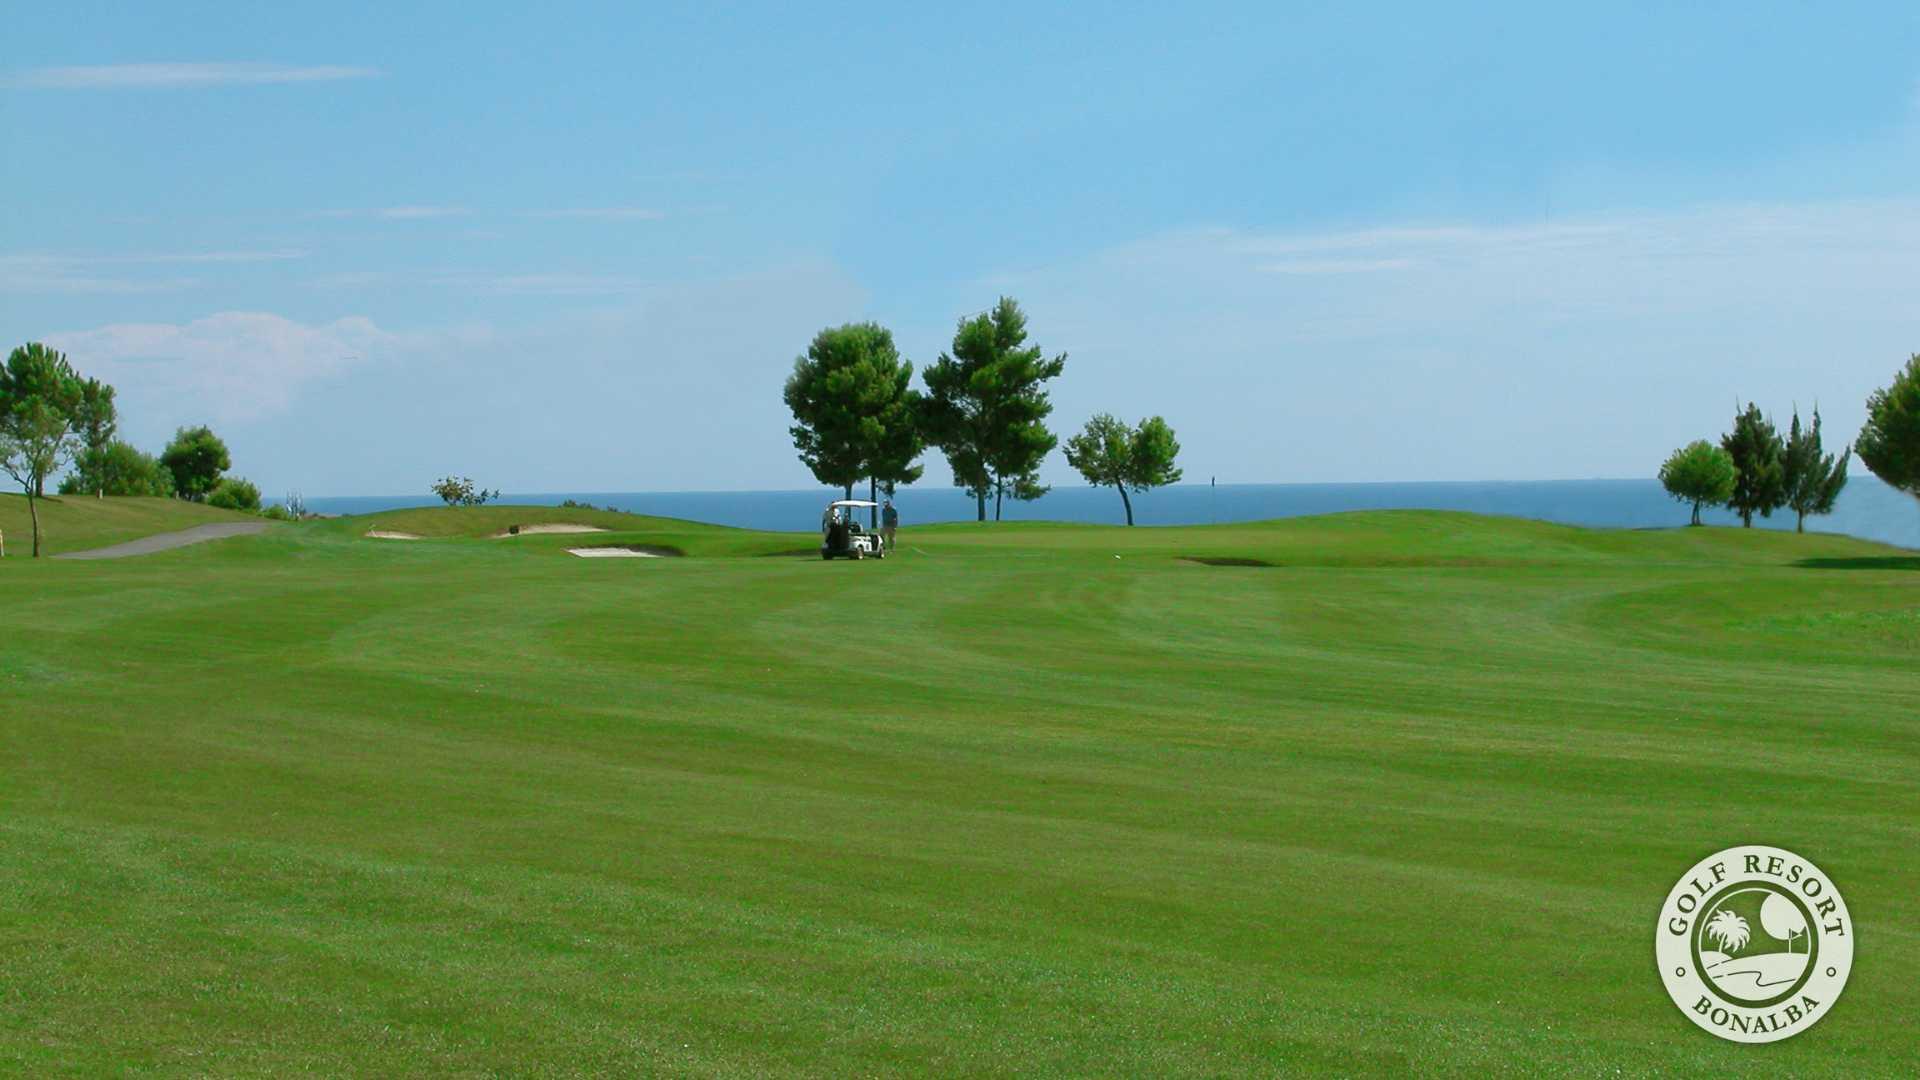 campo golf bonalba